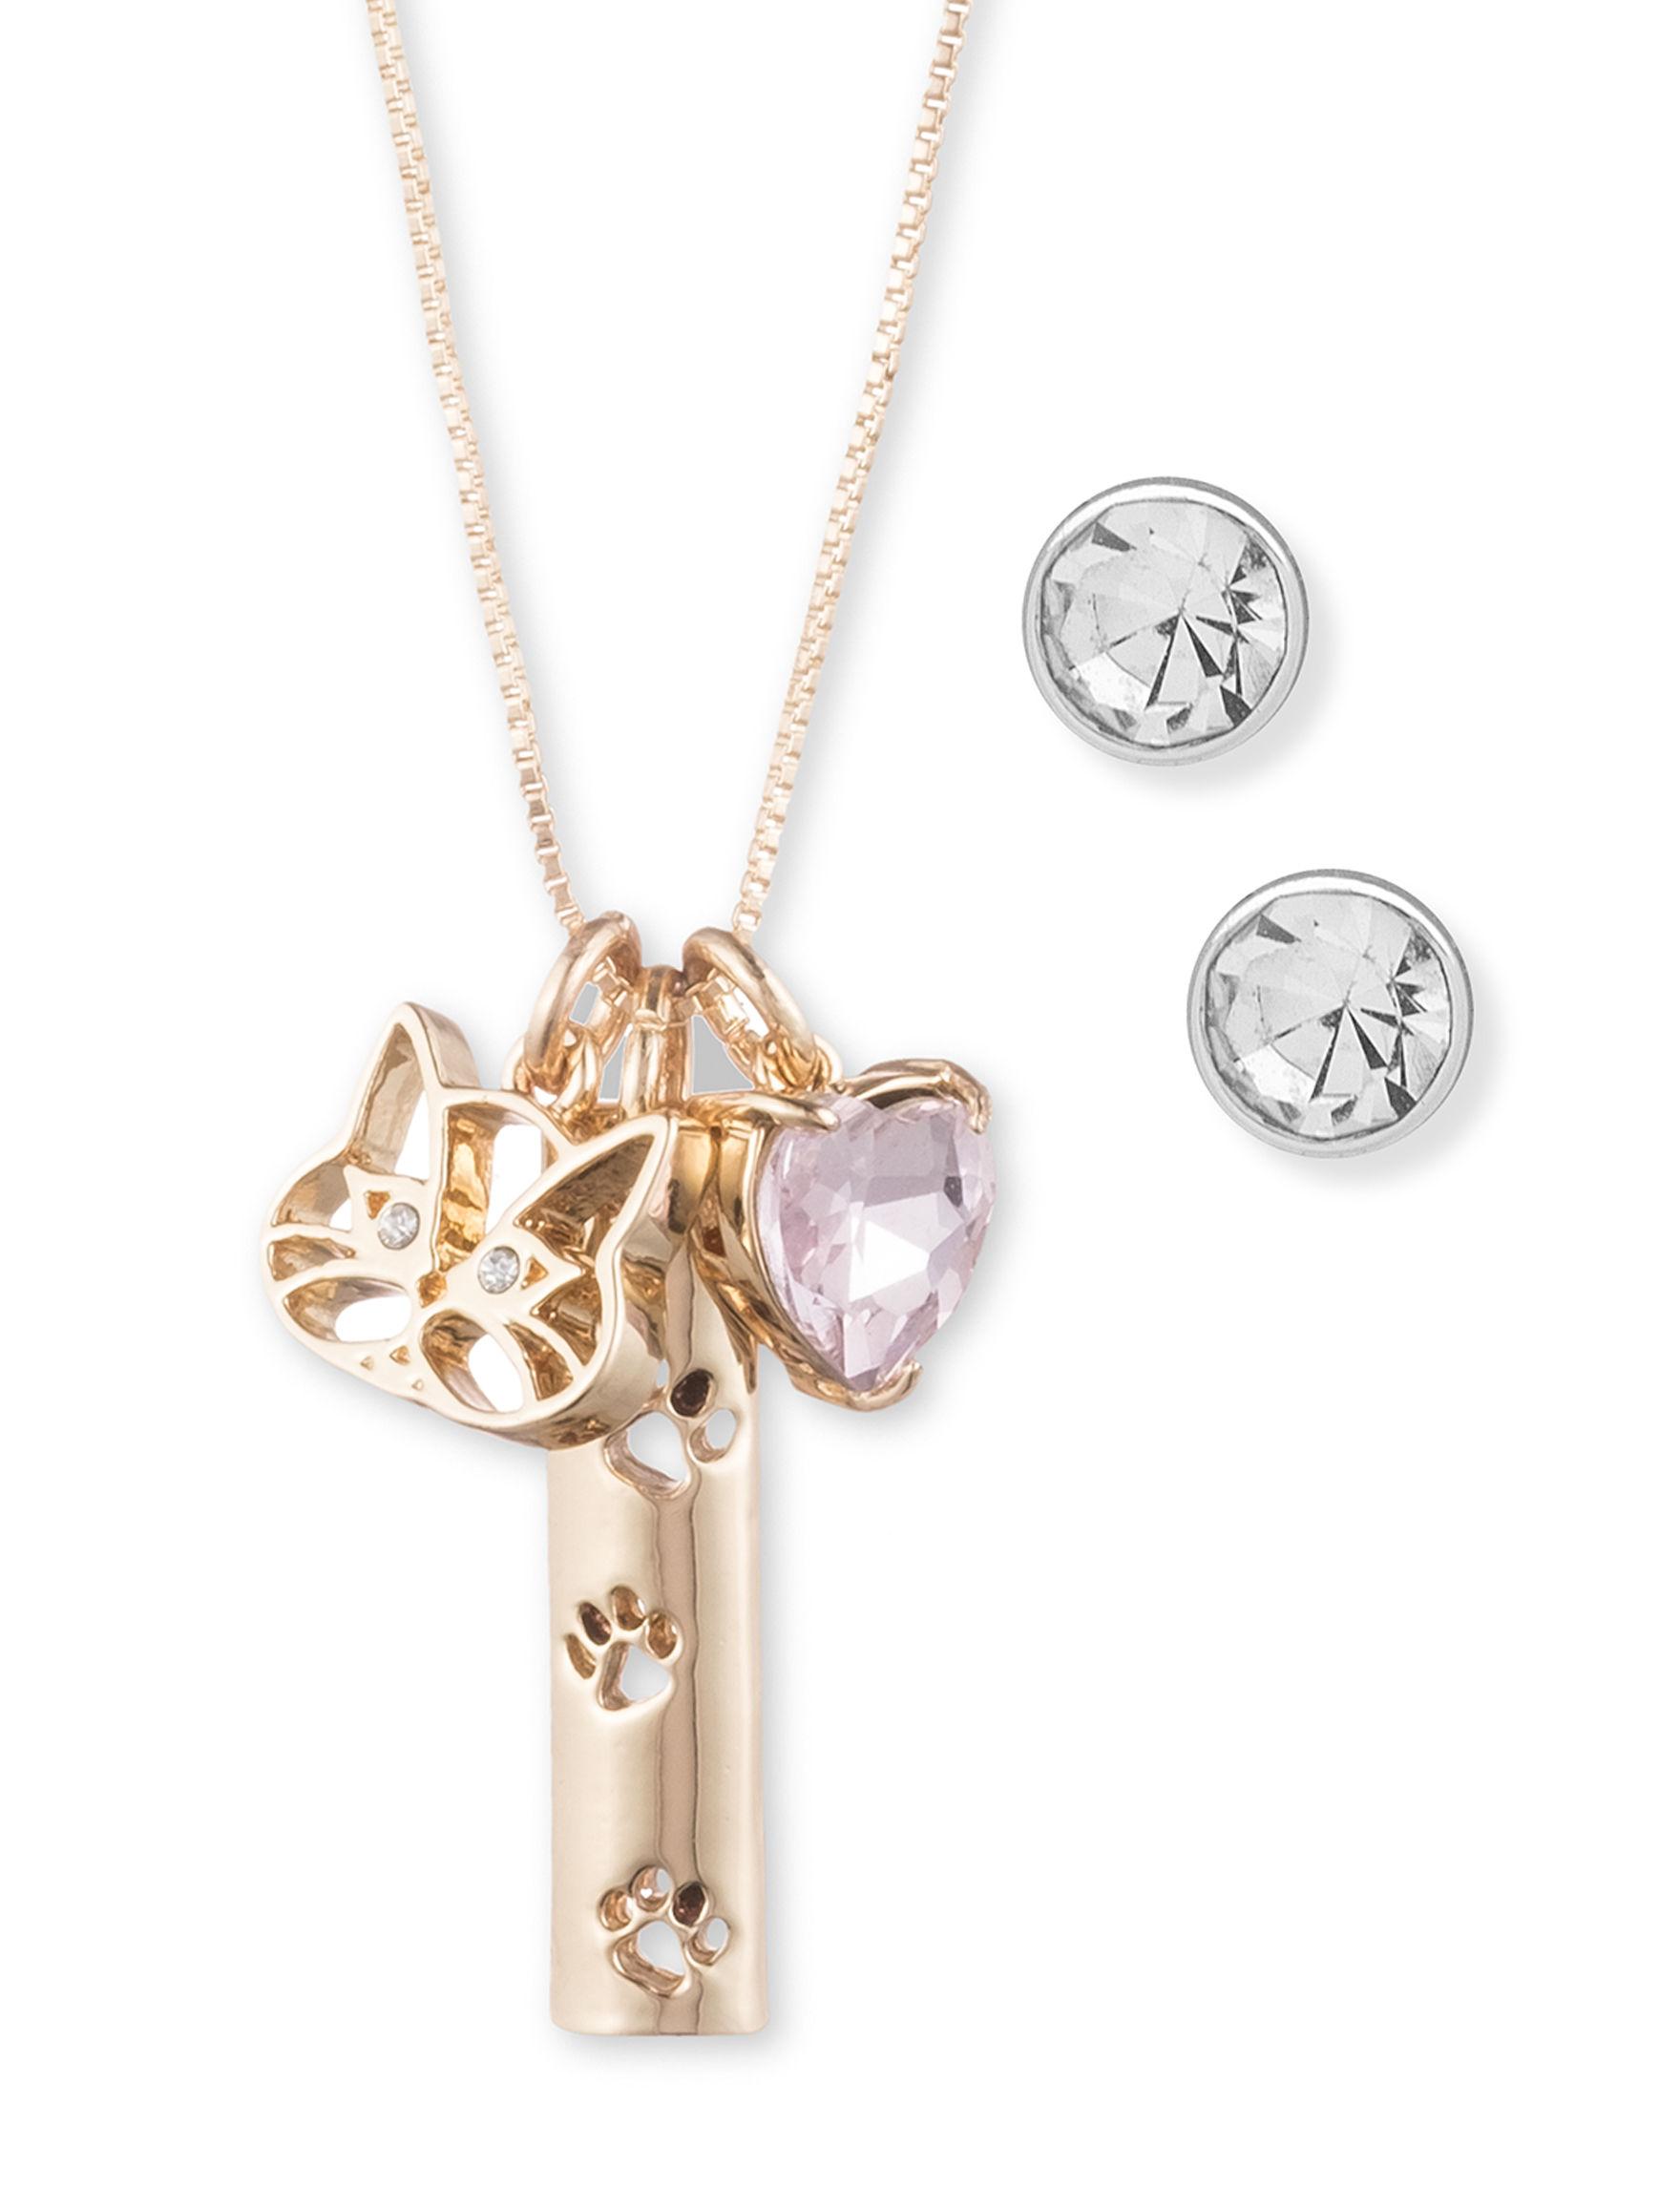 Pet Friends Gold Earrings Necklaces & Pendants Fashion Jewelry